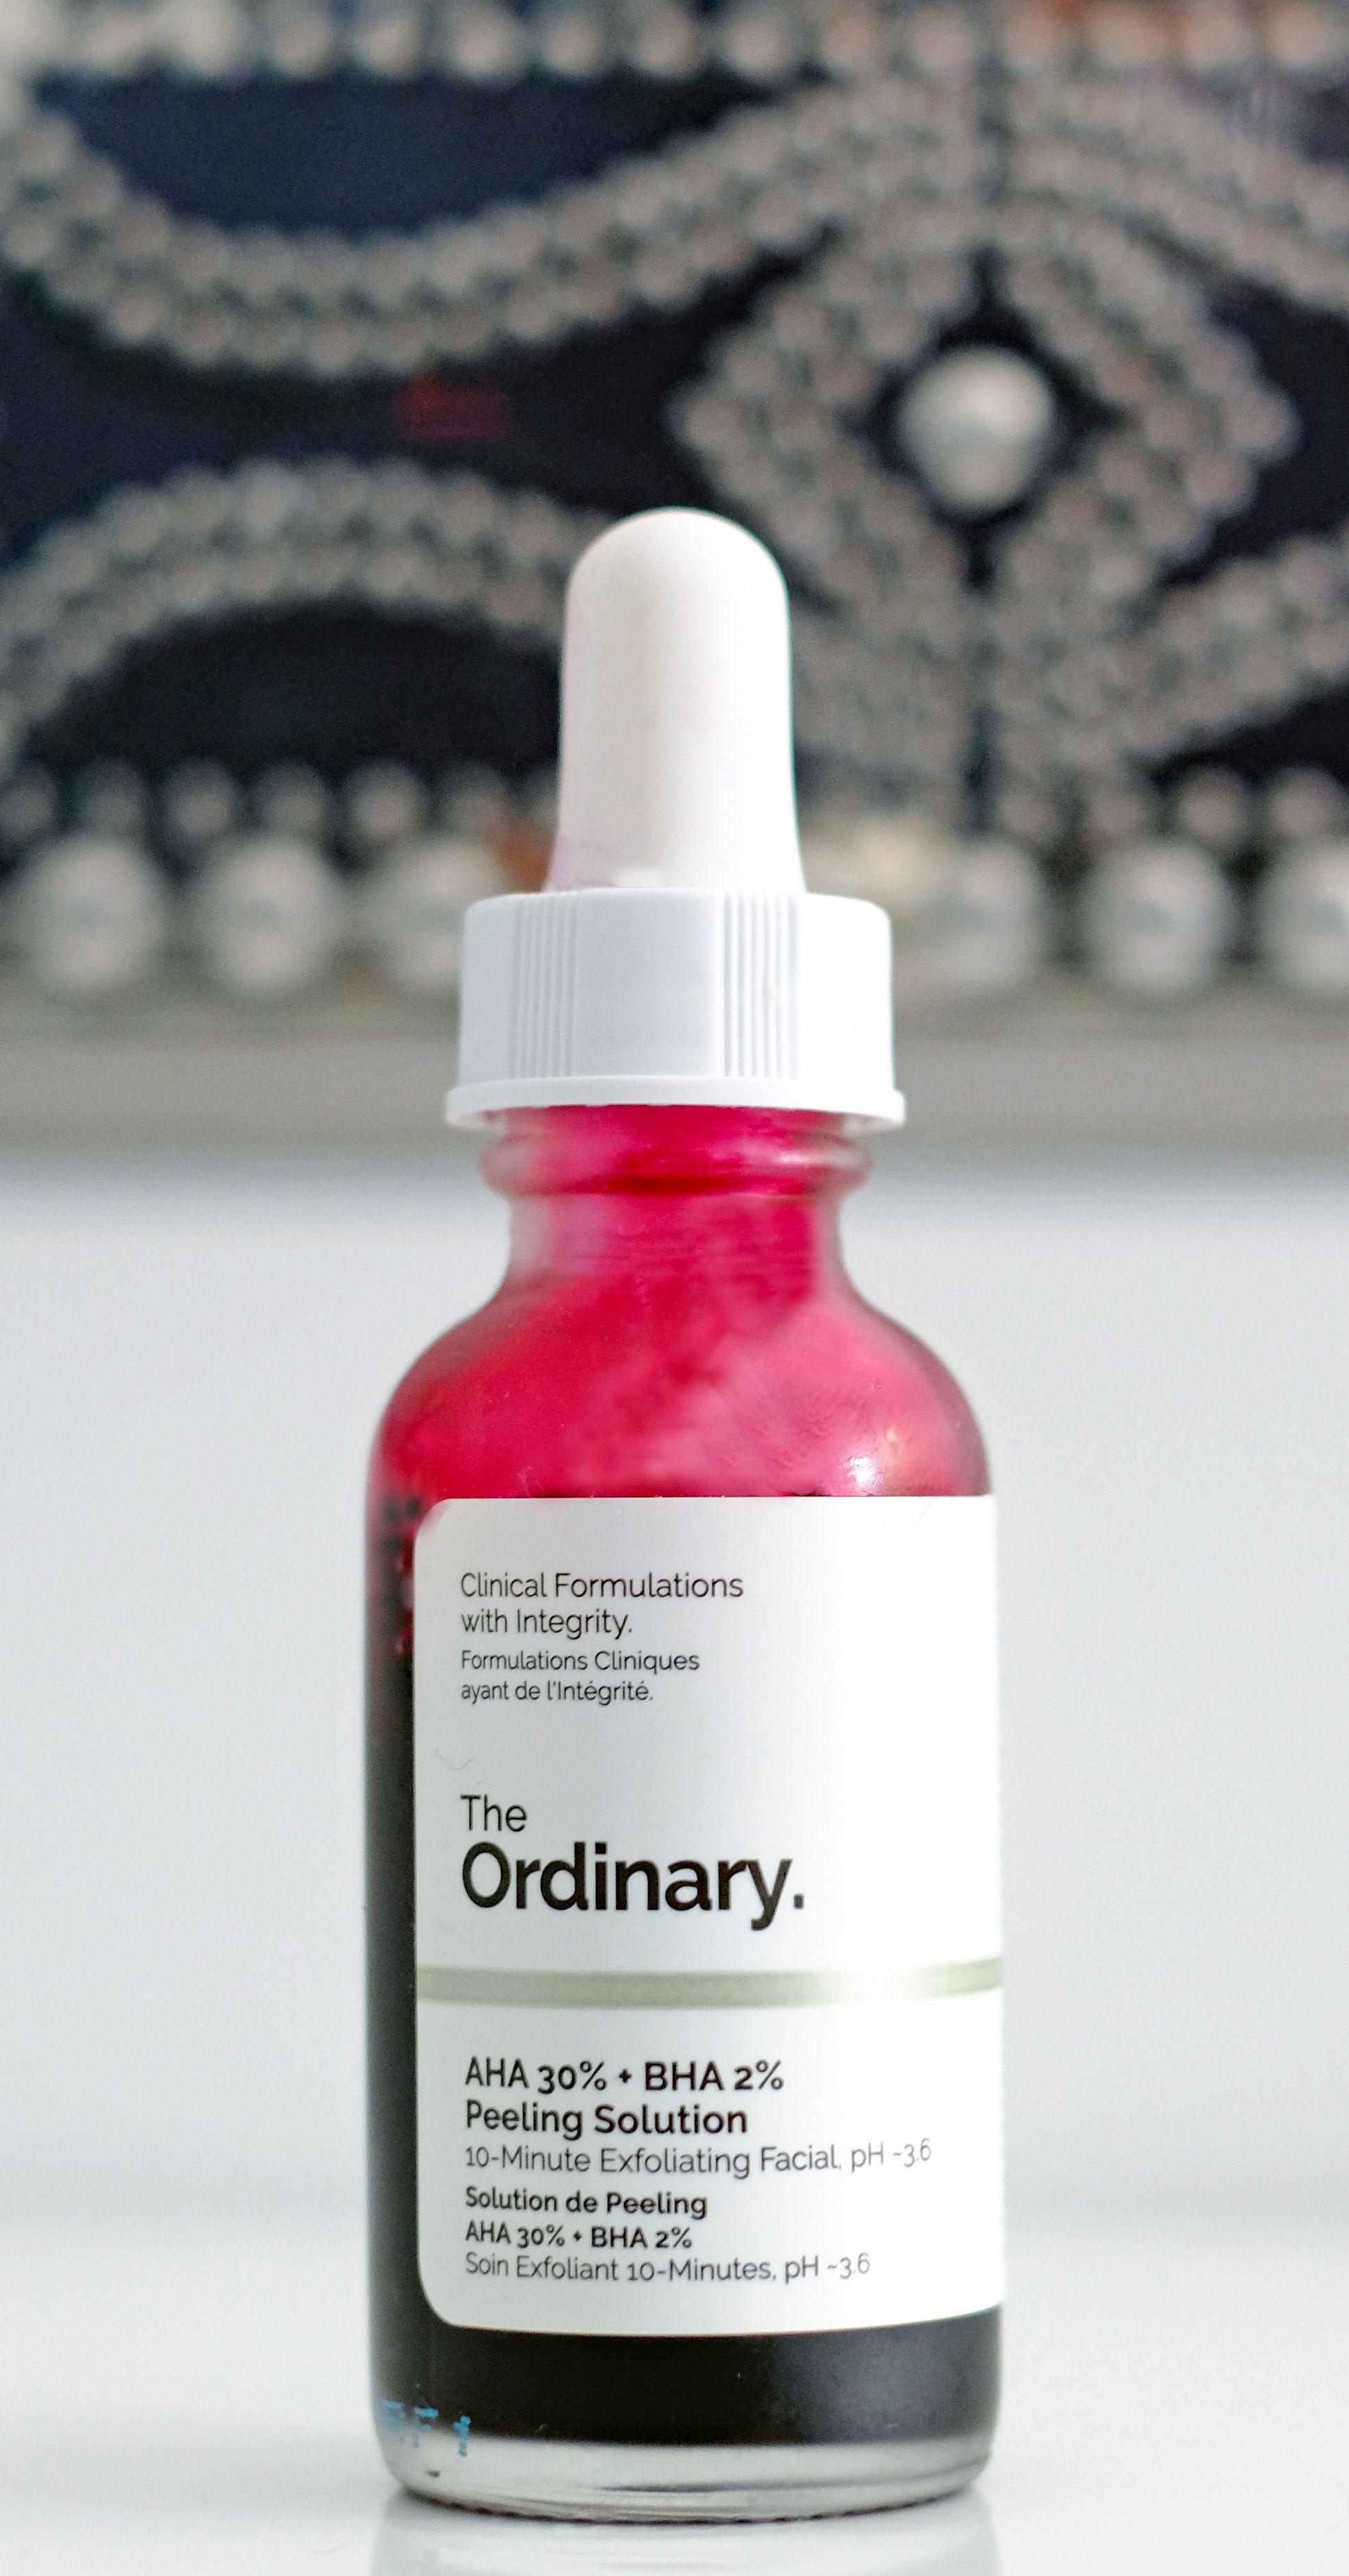 Fruchtsäuren Behandlung von The Ordinary by Deciem AHA 30